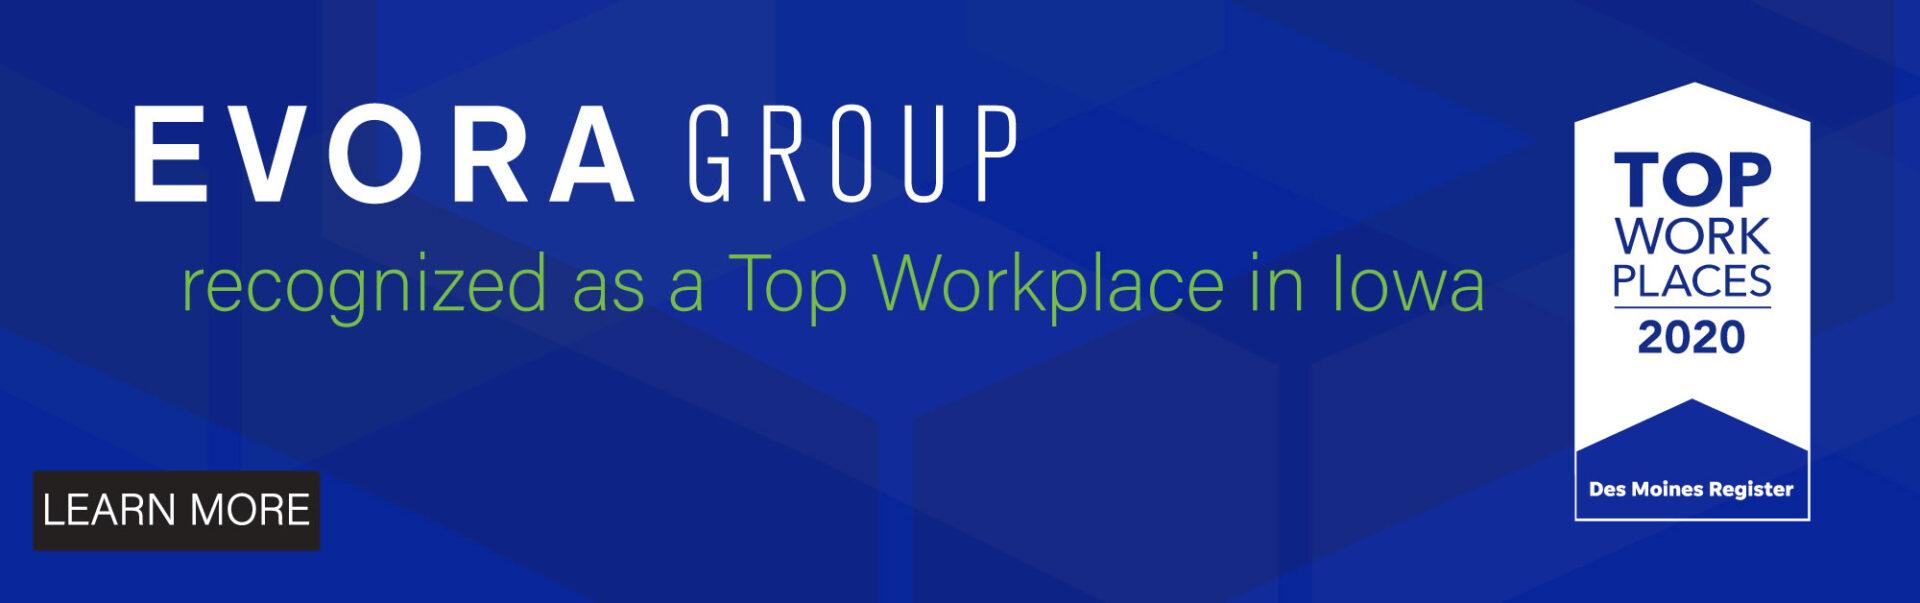 Evora Top Workplace in Iowa Award.